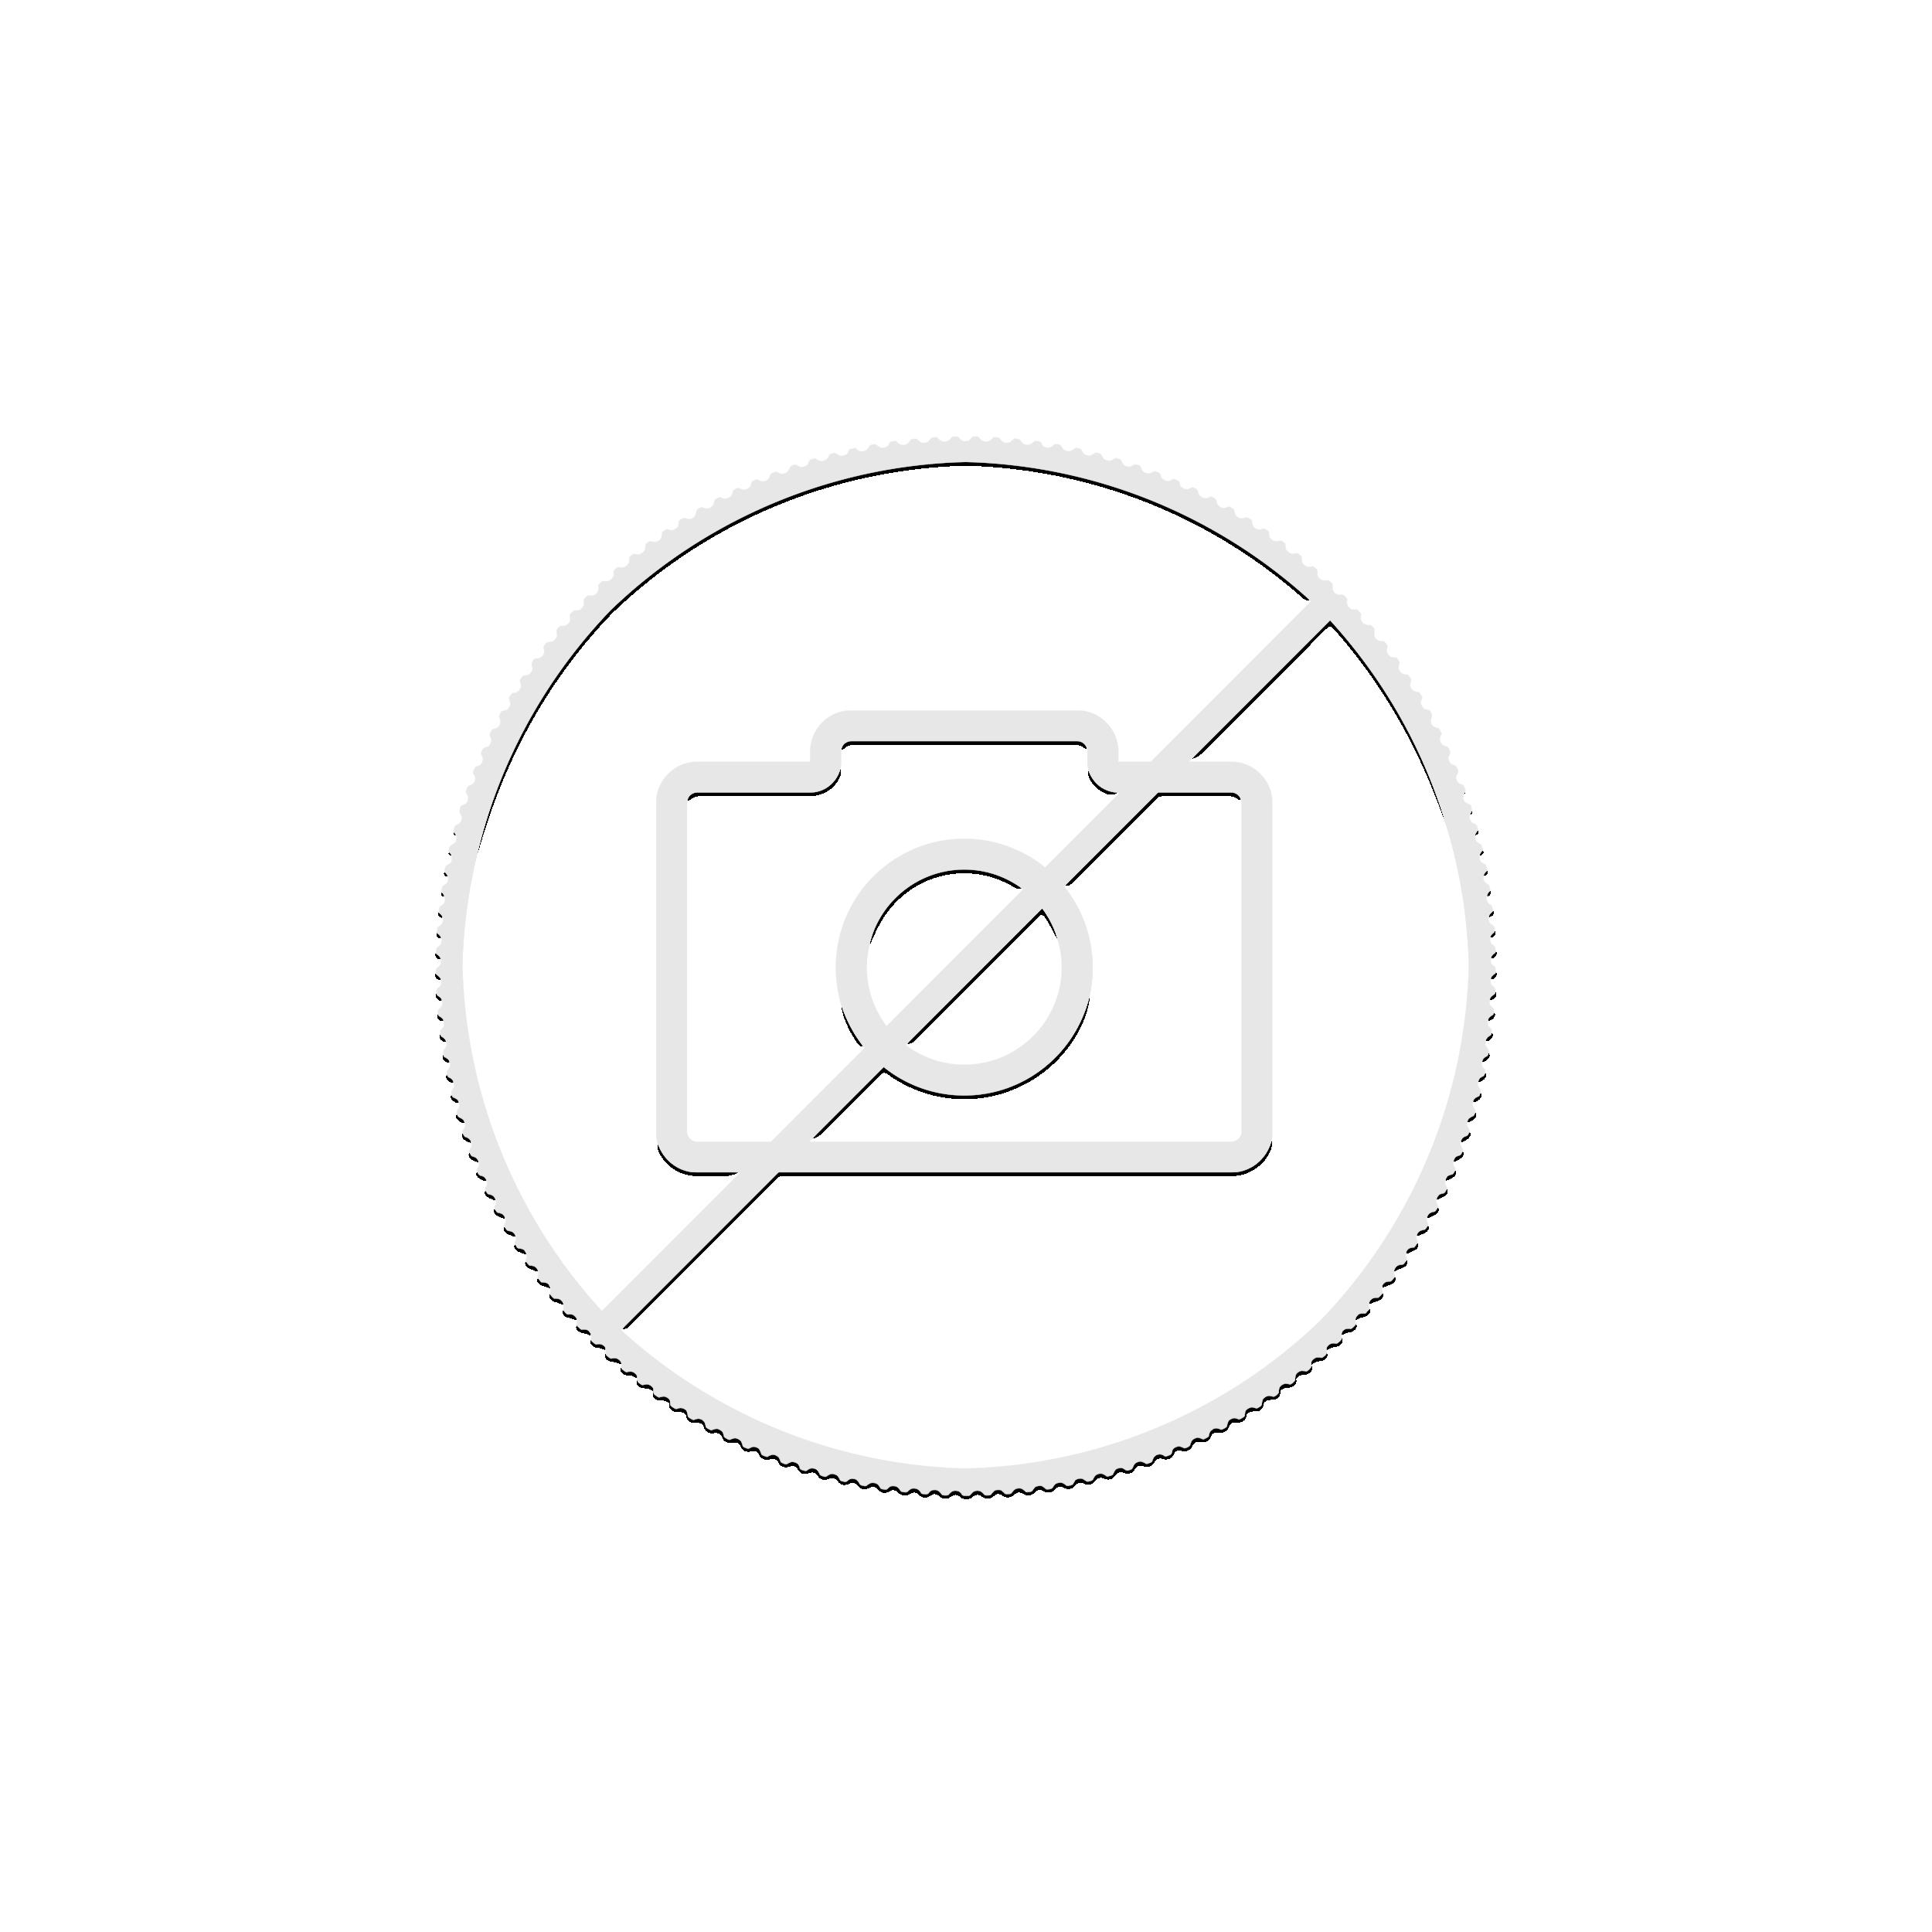 1 troy ounce silver Maple Leaf 2020